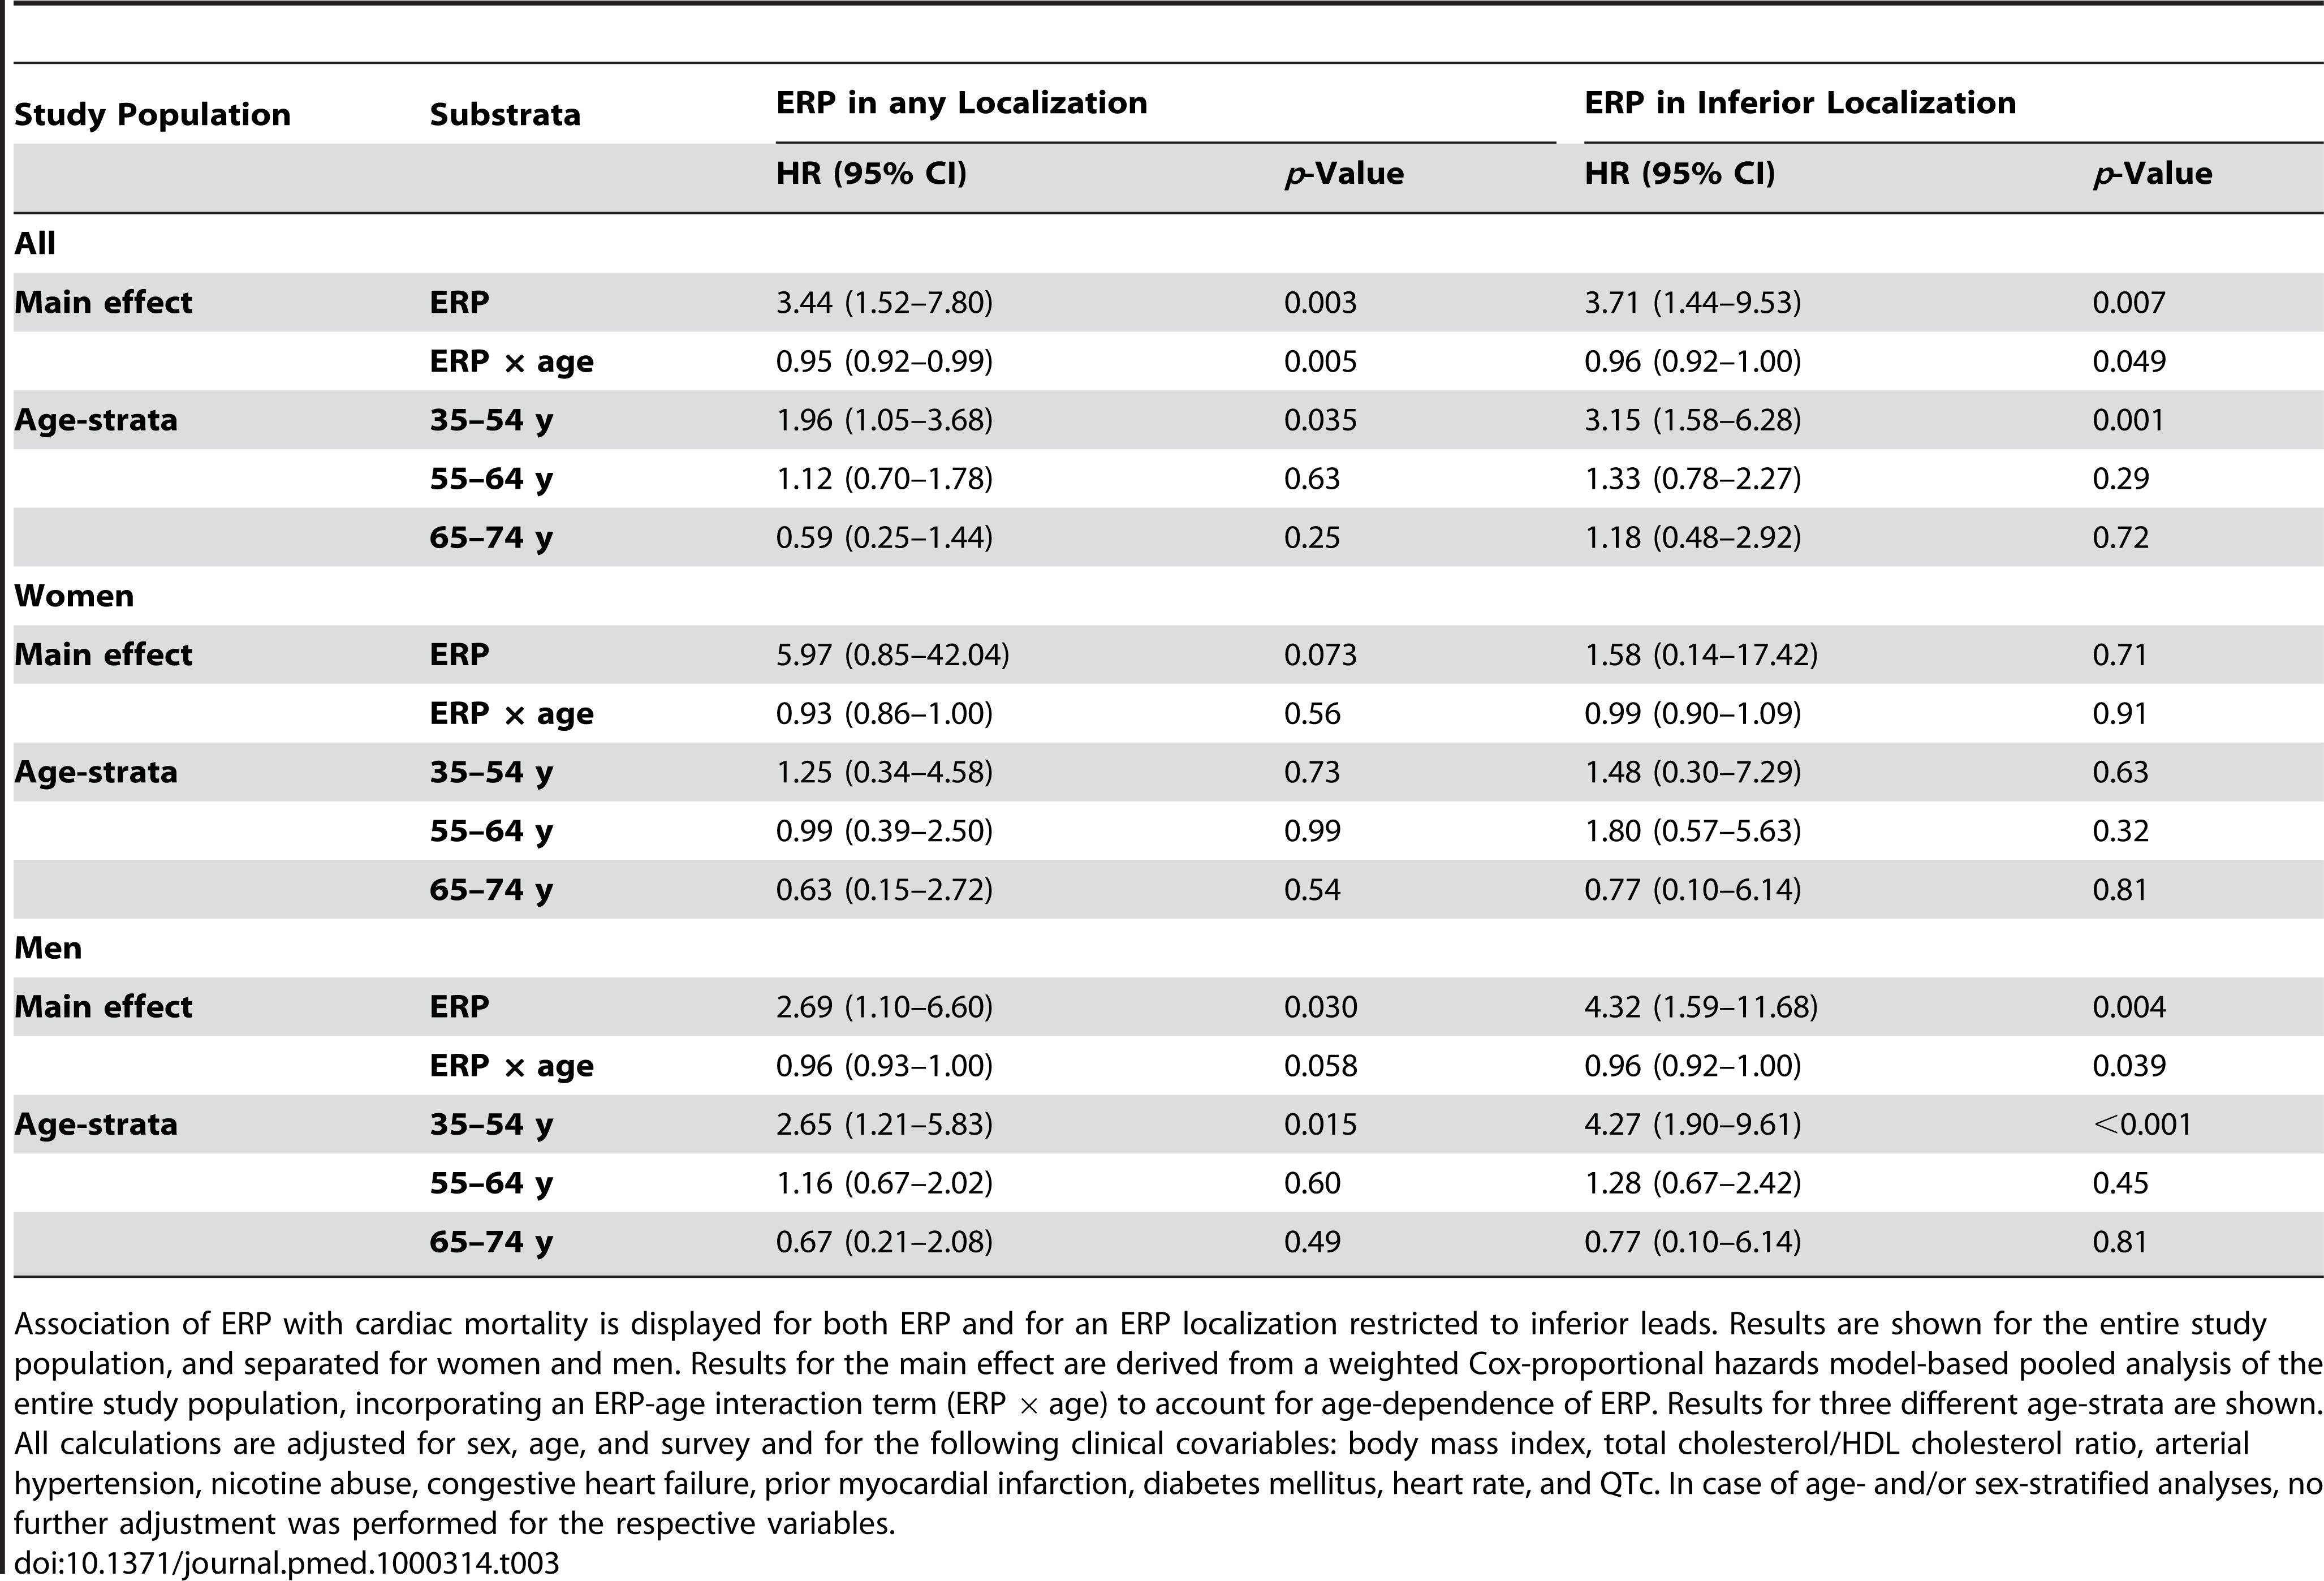 Association of ERP with cardiac mortality.